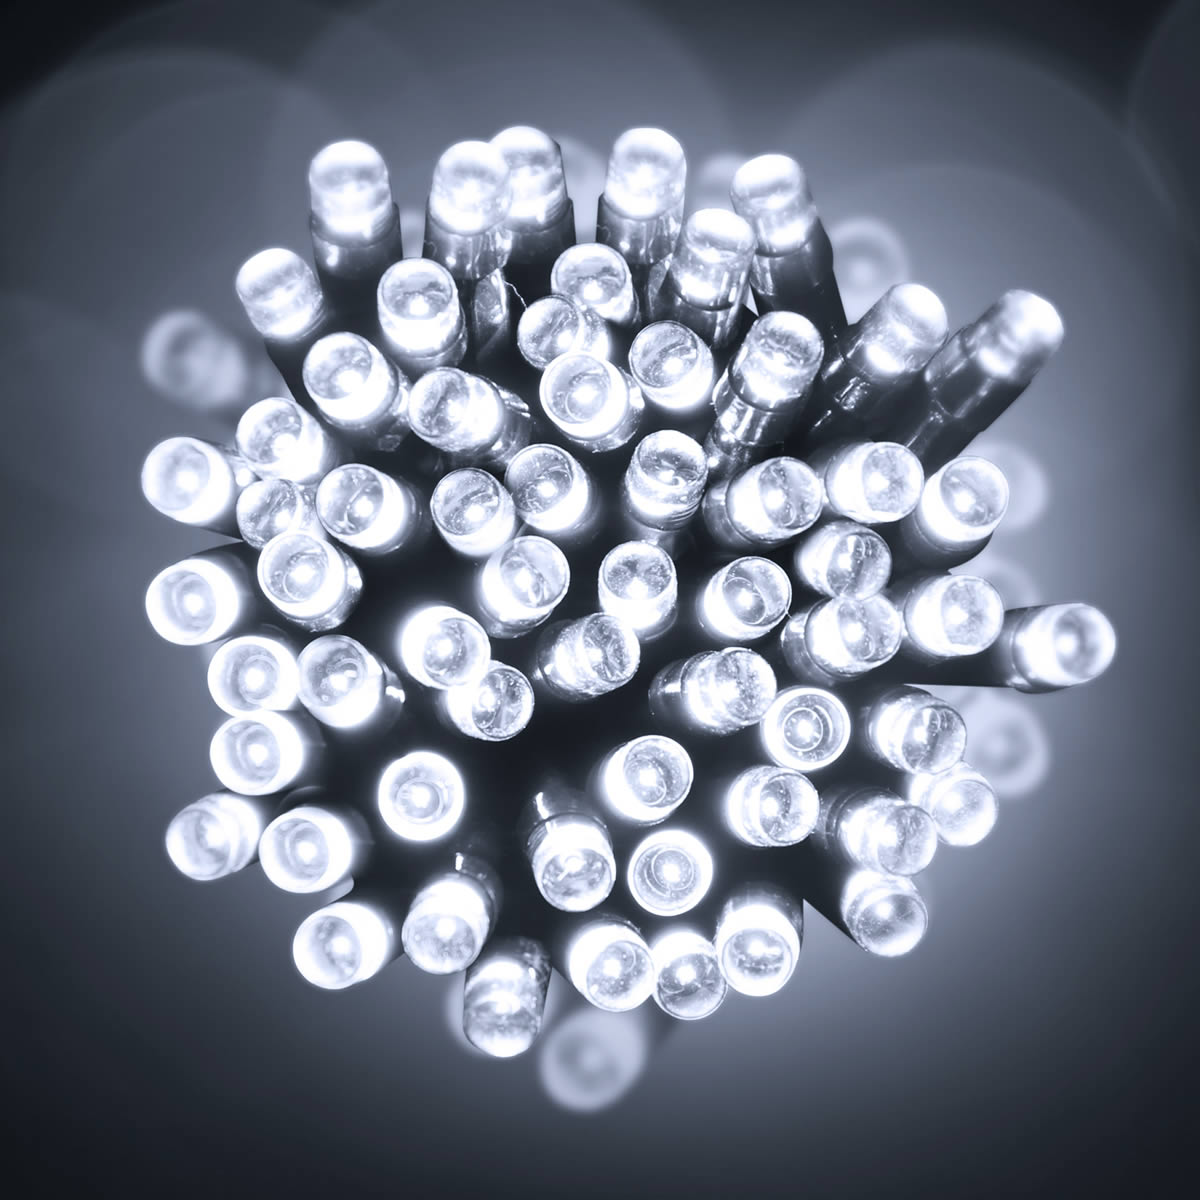 200 Cold White LED Battery Lights